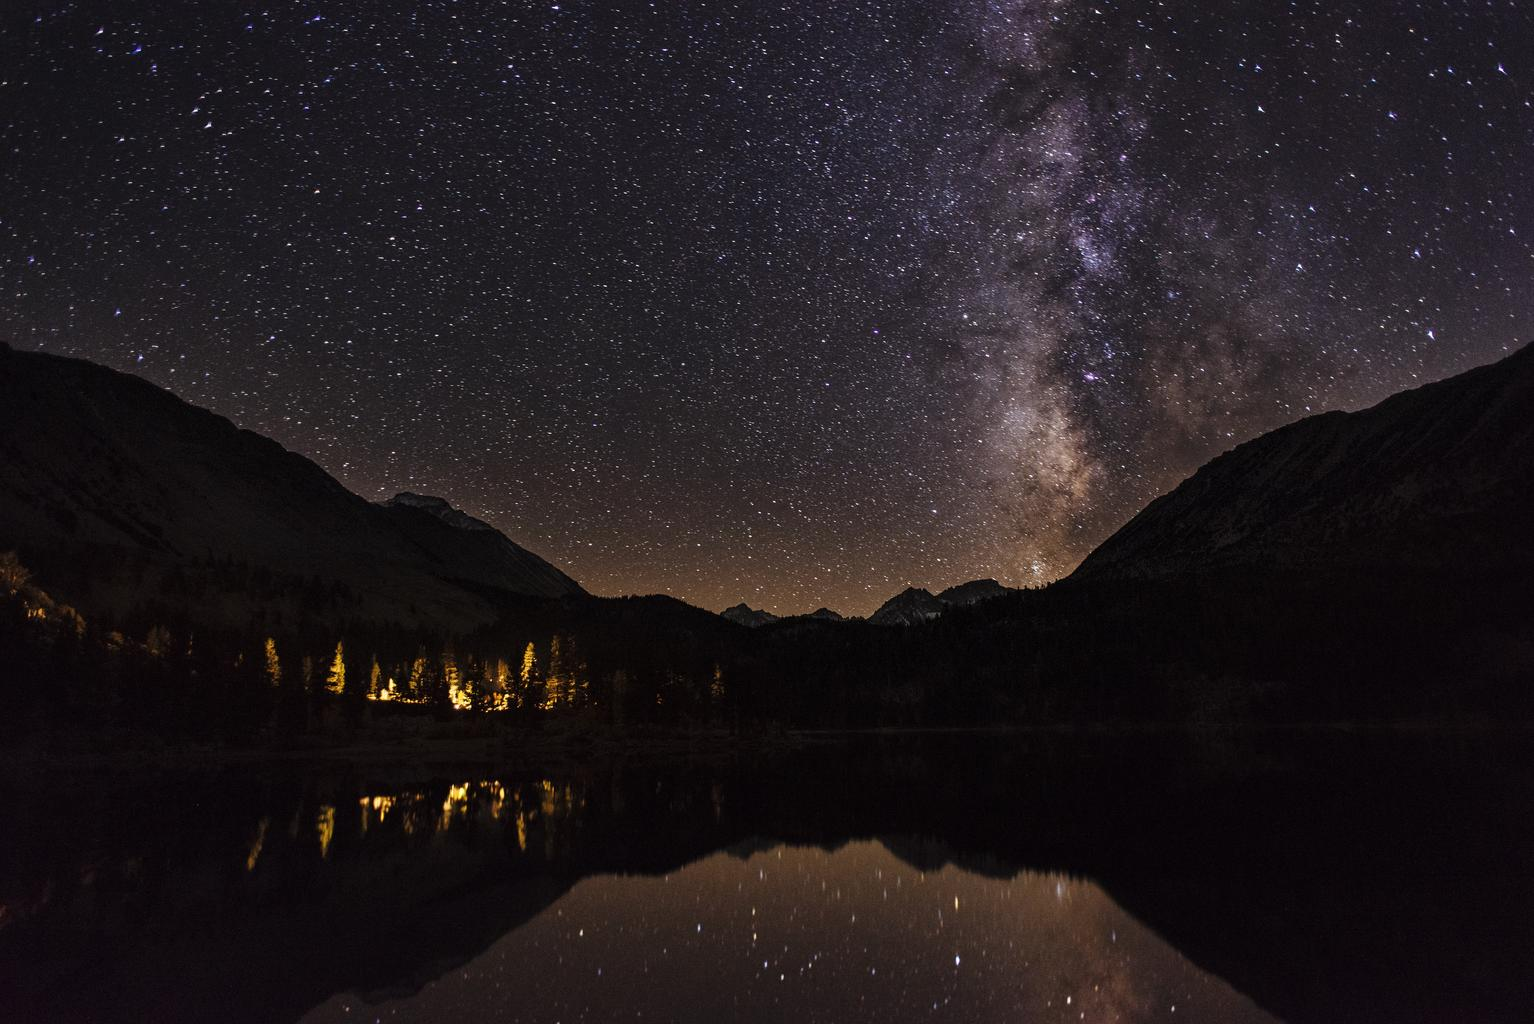 starry_night_mountains_landscape_0.jpg